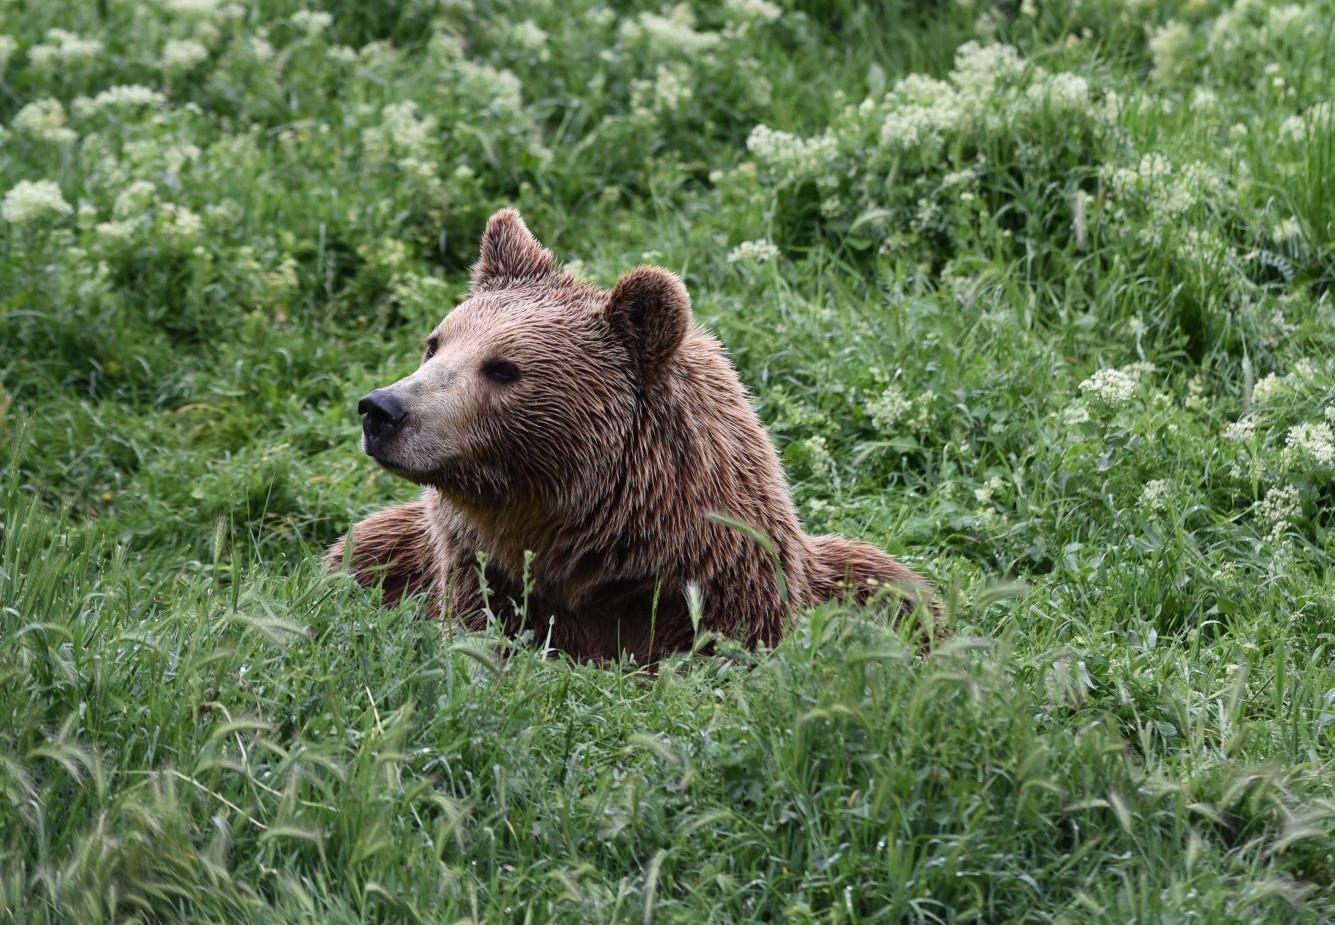 Bear Anik at BEAR SANCTUARY Prishtina